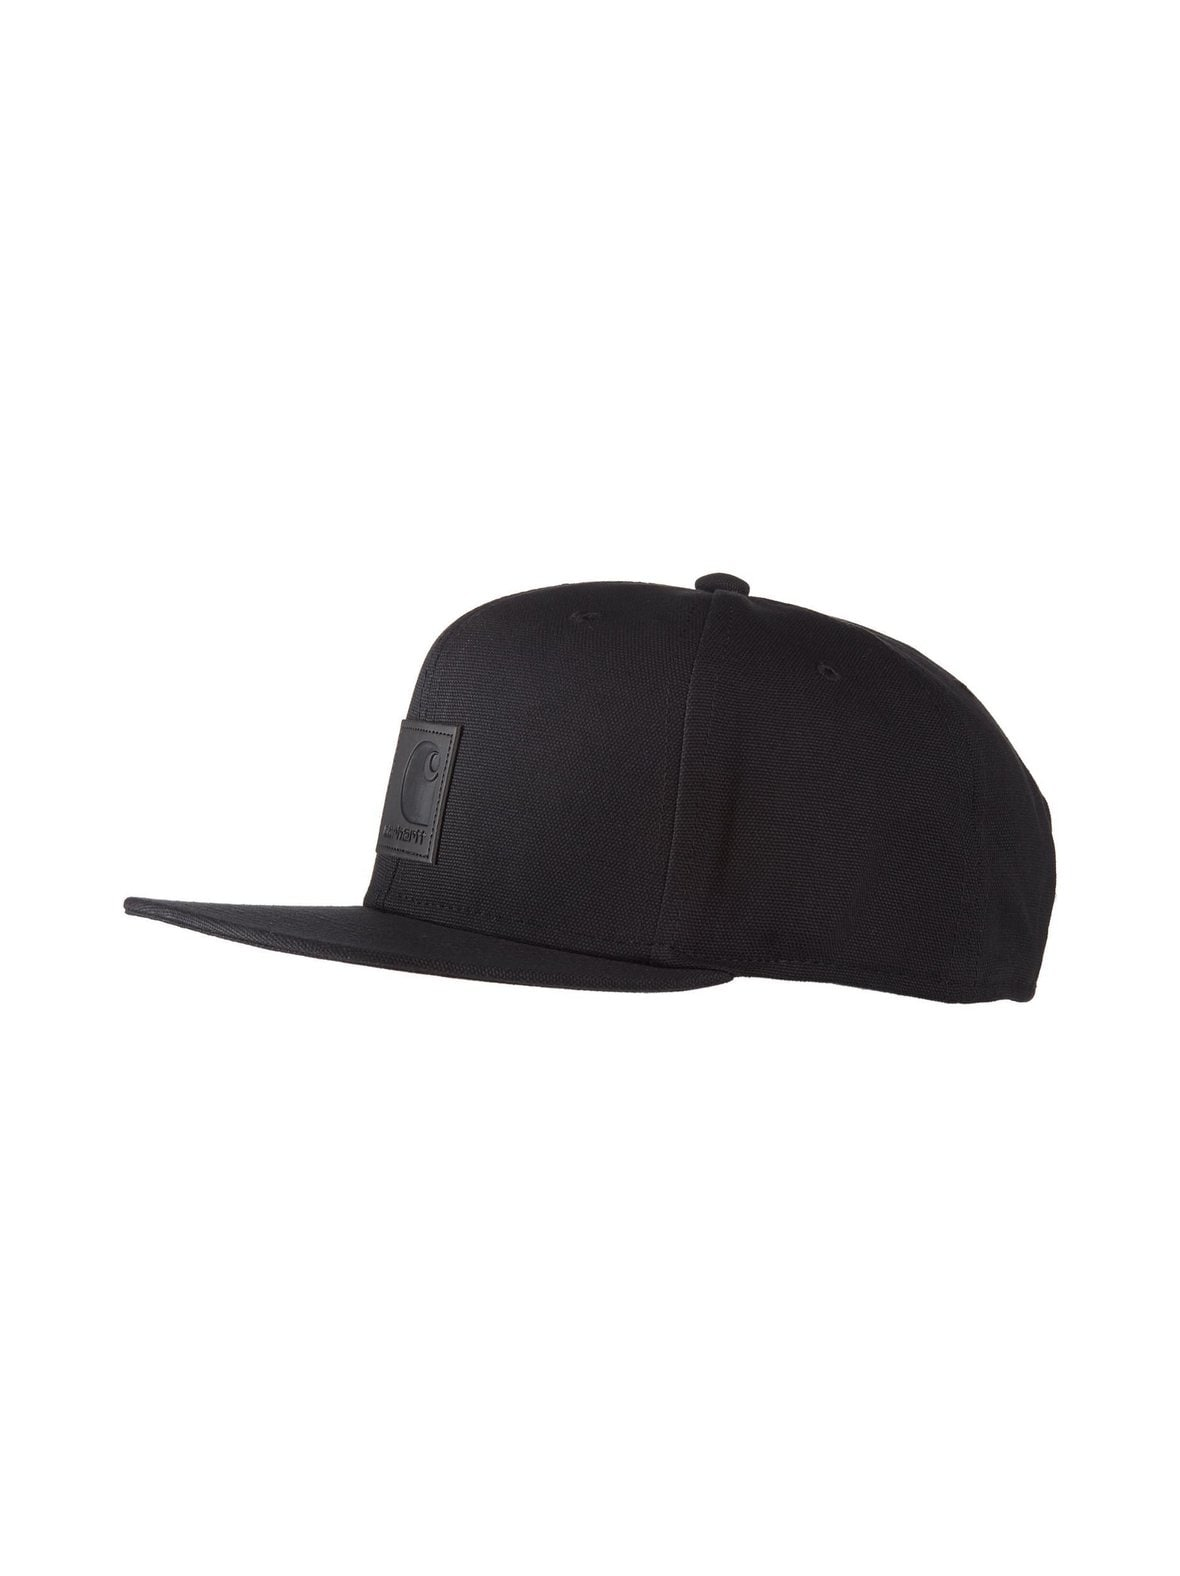 Black (musta) Carhartt I023099 01 Logo Cap -lippalakki  ac8ad9edee